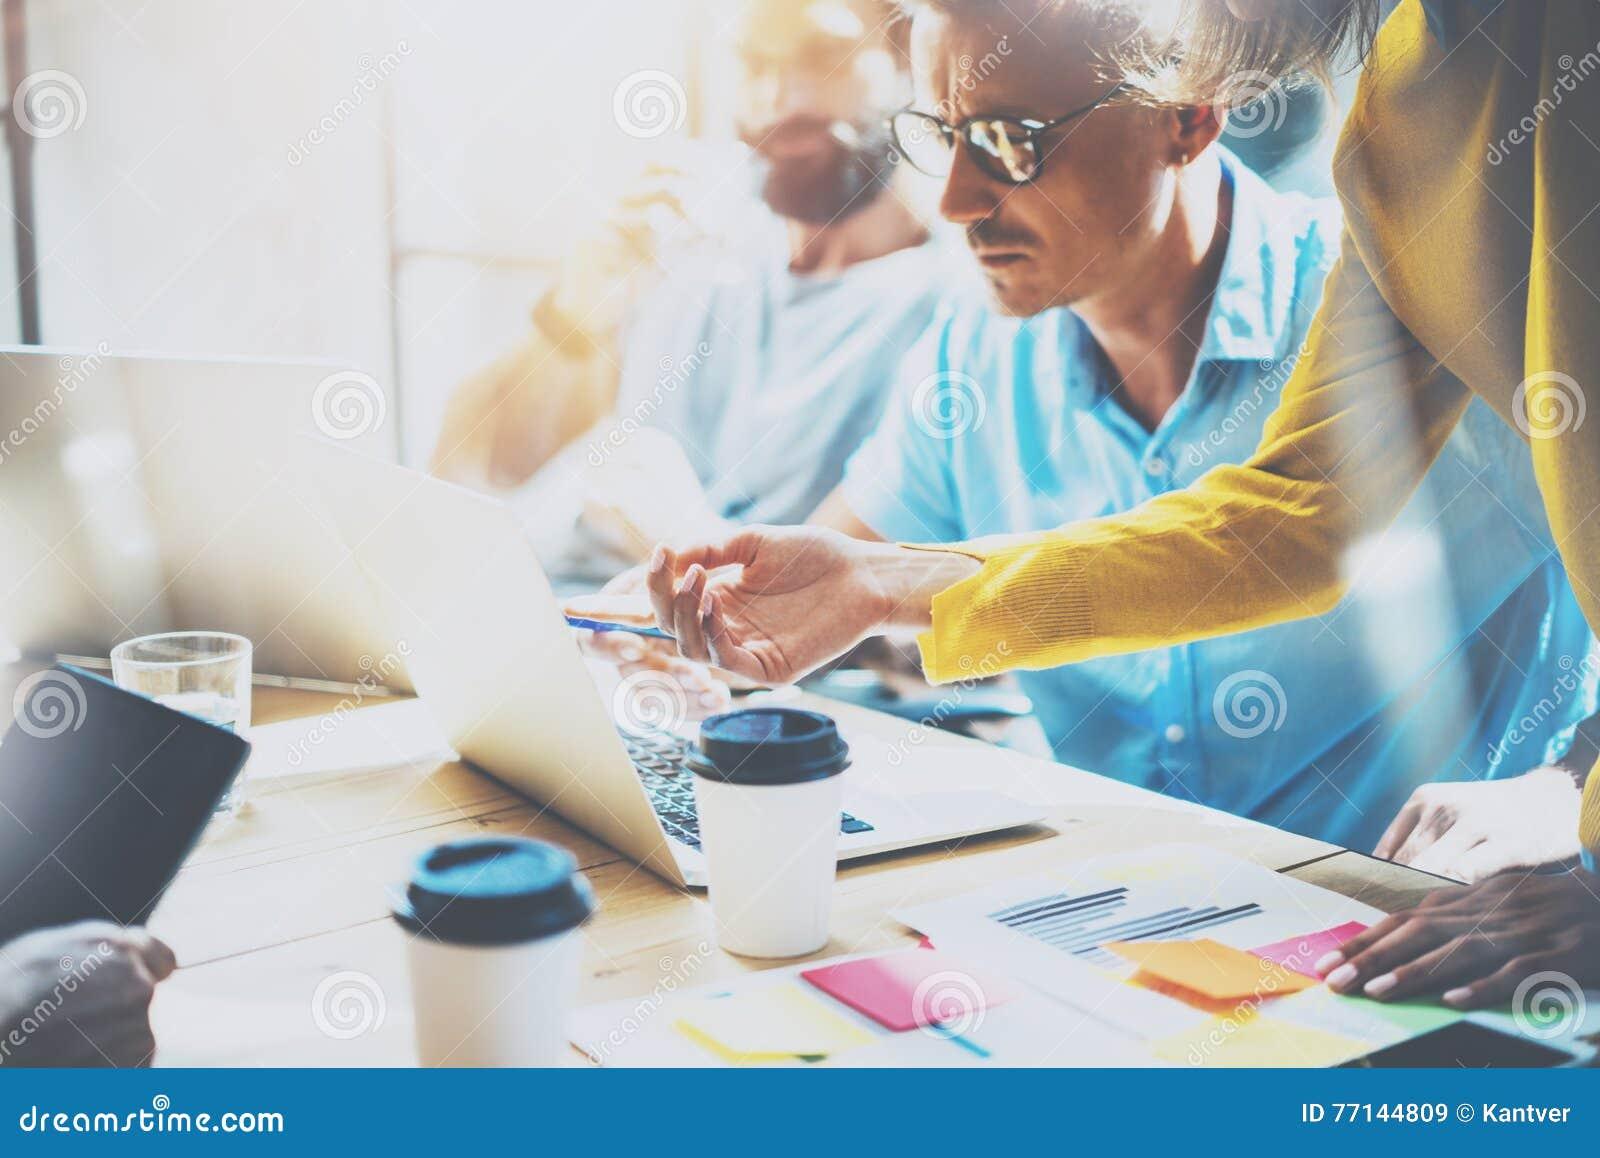 BarngruppCoworkers som gör stora affärsbeslut Idérik Team Discussion Corporate Work Concept studio Ny start